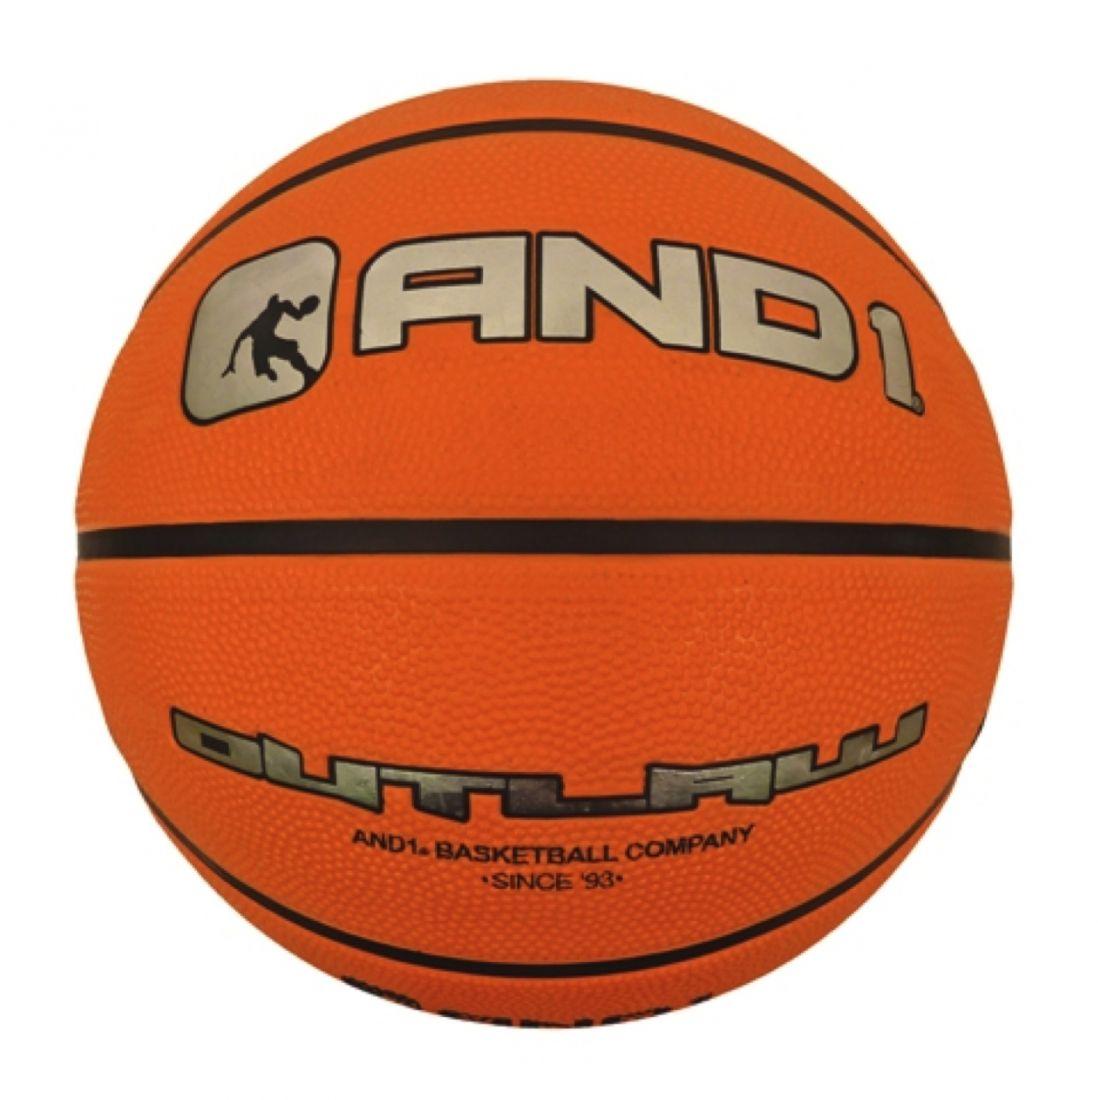 Баскетбольный мяч AND1 Outlaw